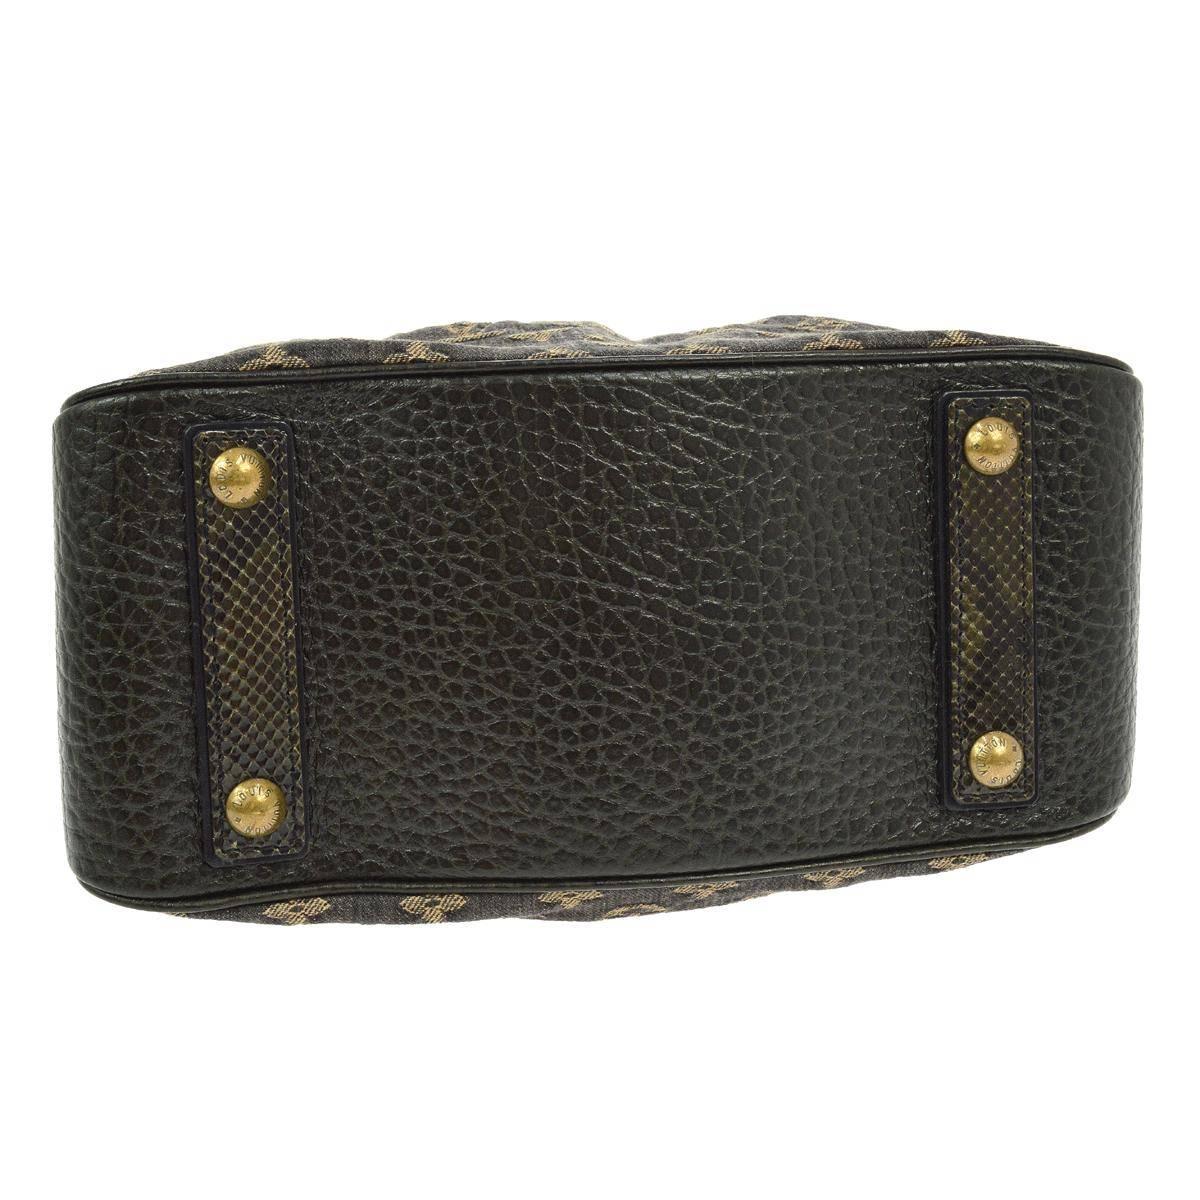 Louis Vuitton Limited Edition Brown Monogram Fur Top Handle Evening Satchel Bag y2N93k